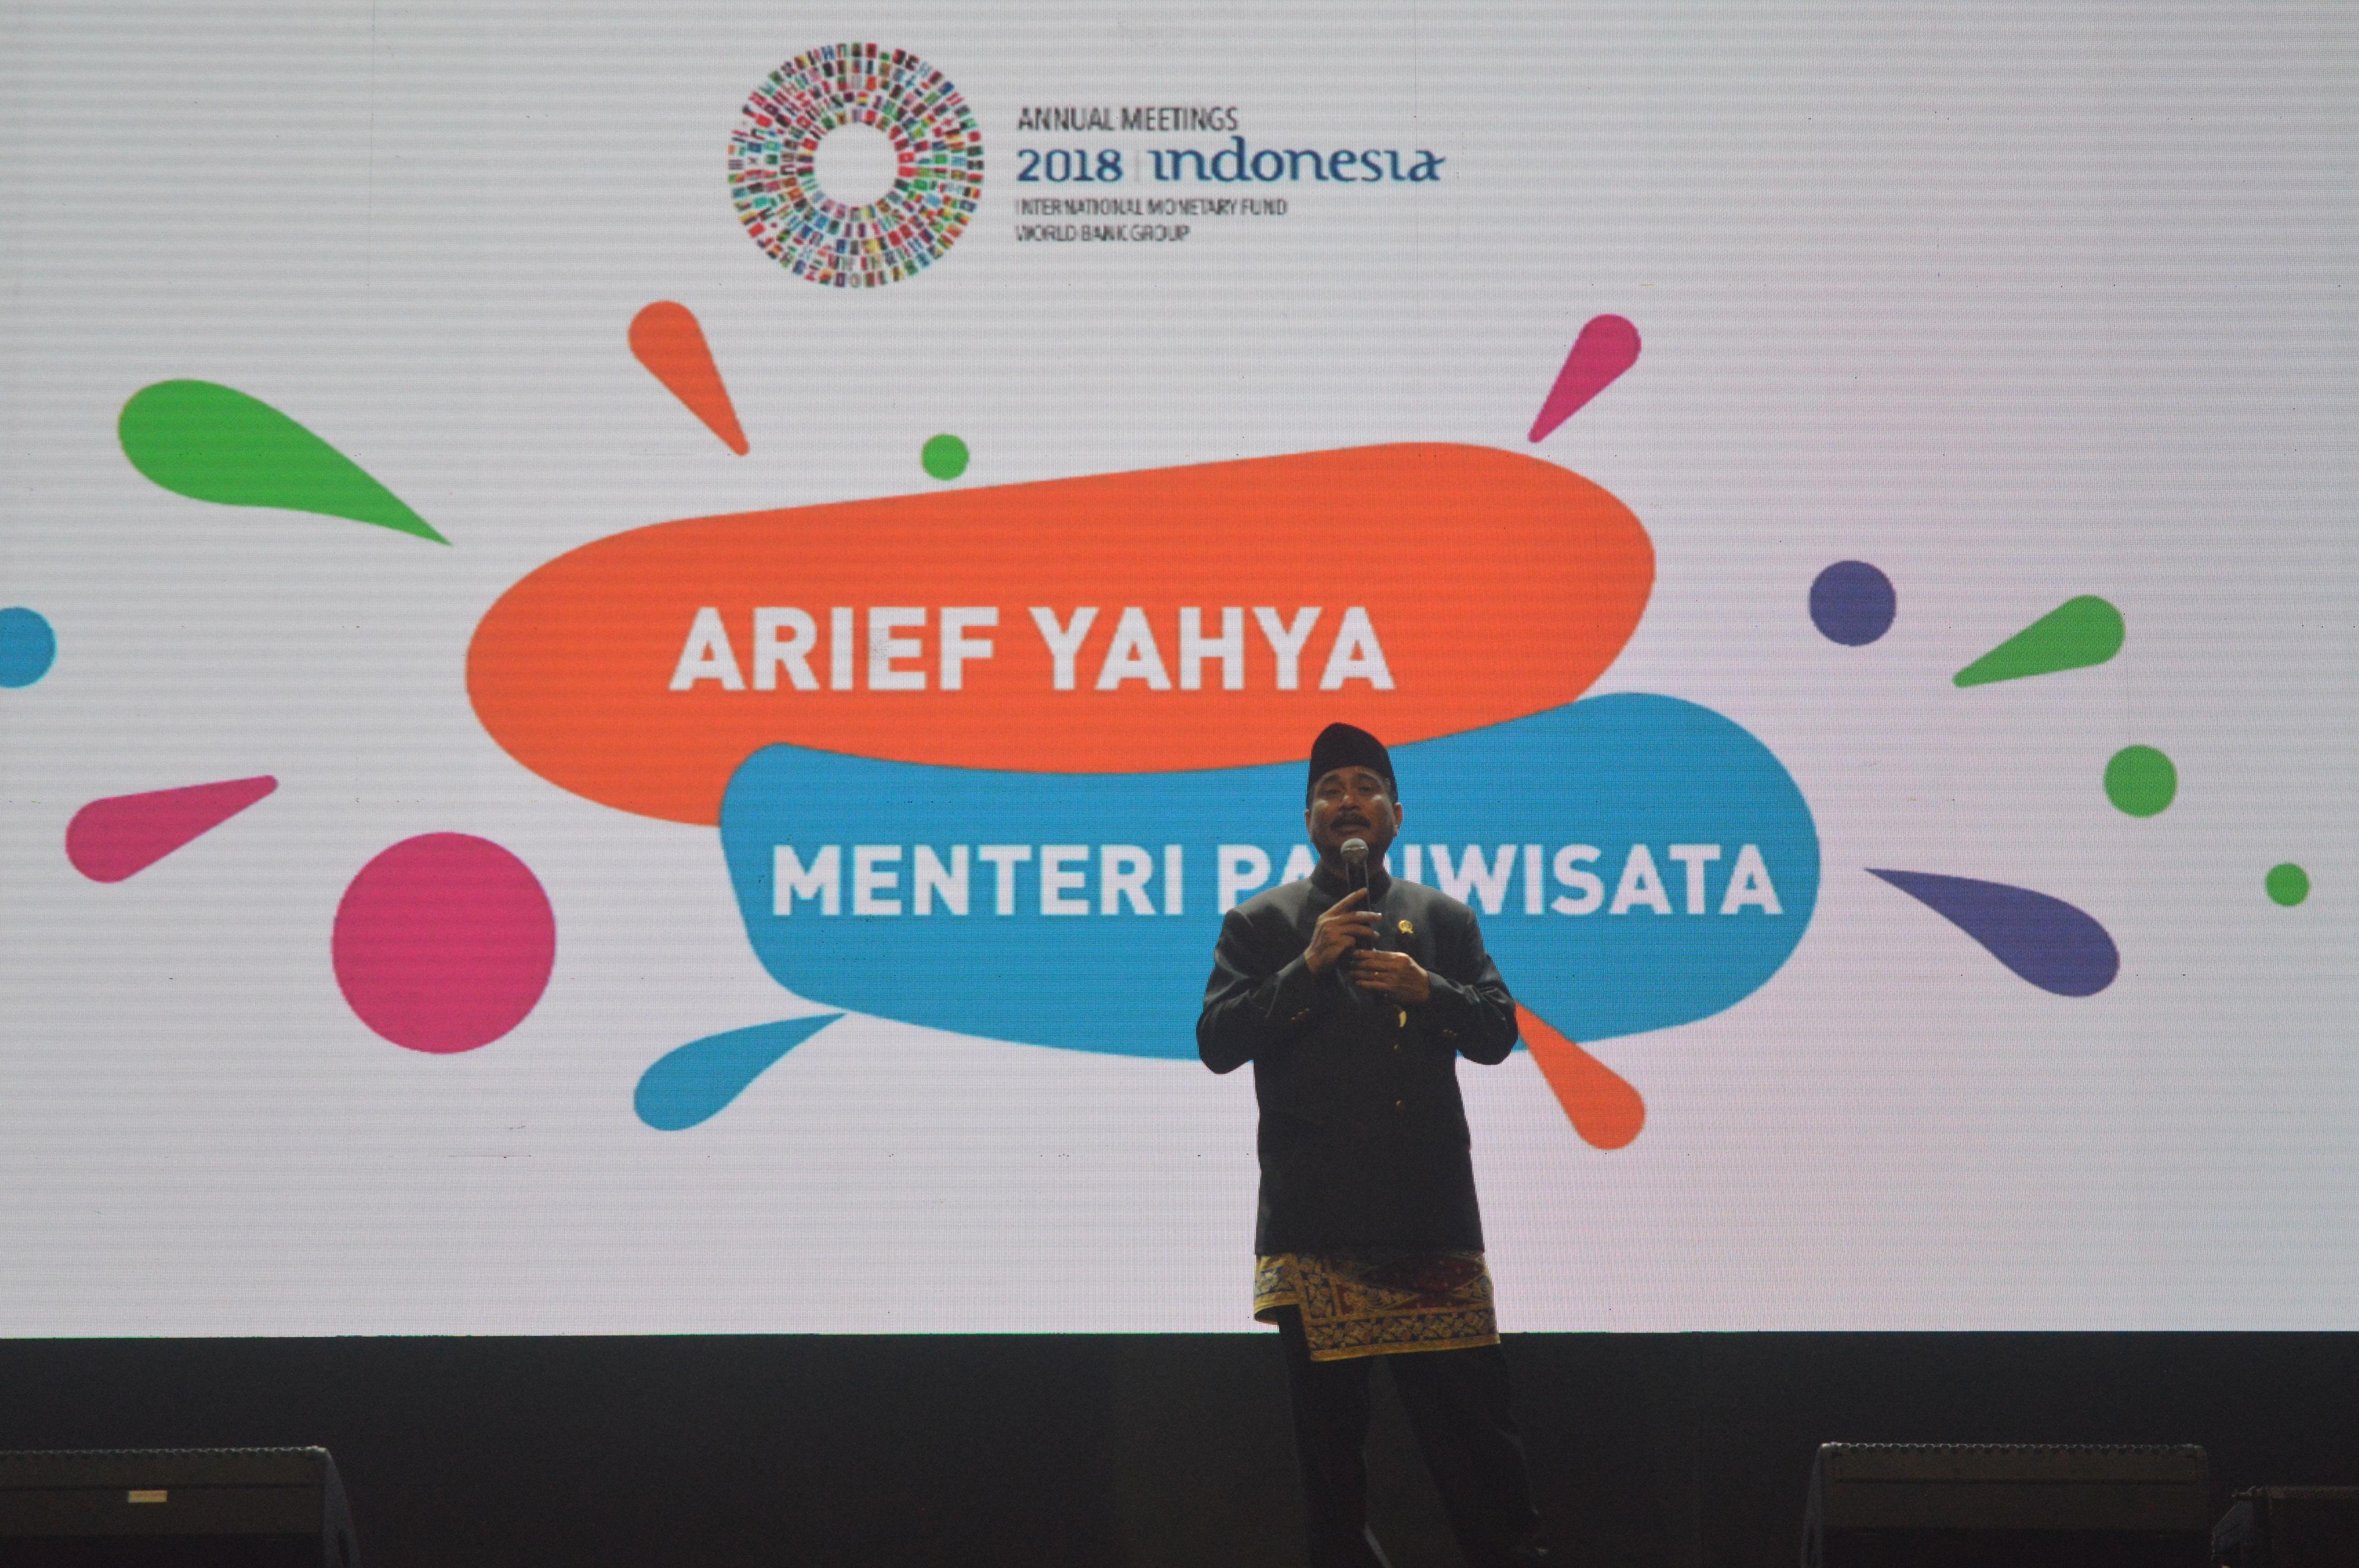 Photo of Rakernas IV : Menpar Arief Yahya Optimis Pariwisata Jadi Core Sector Ekonomi Indonesia